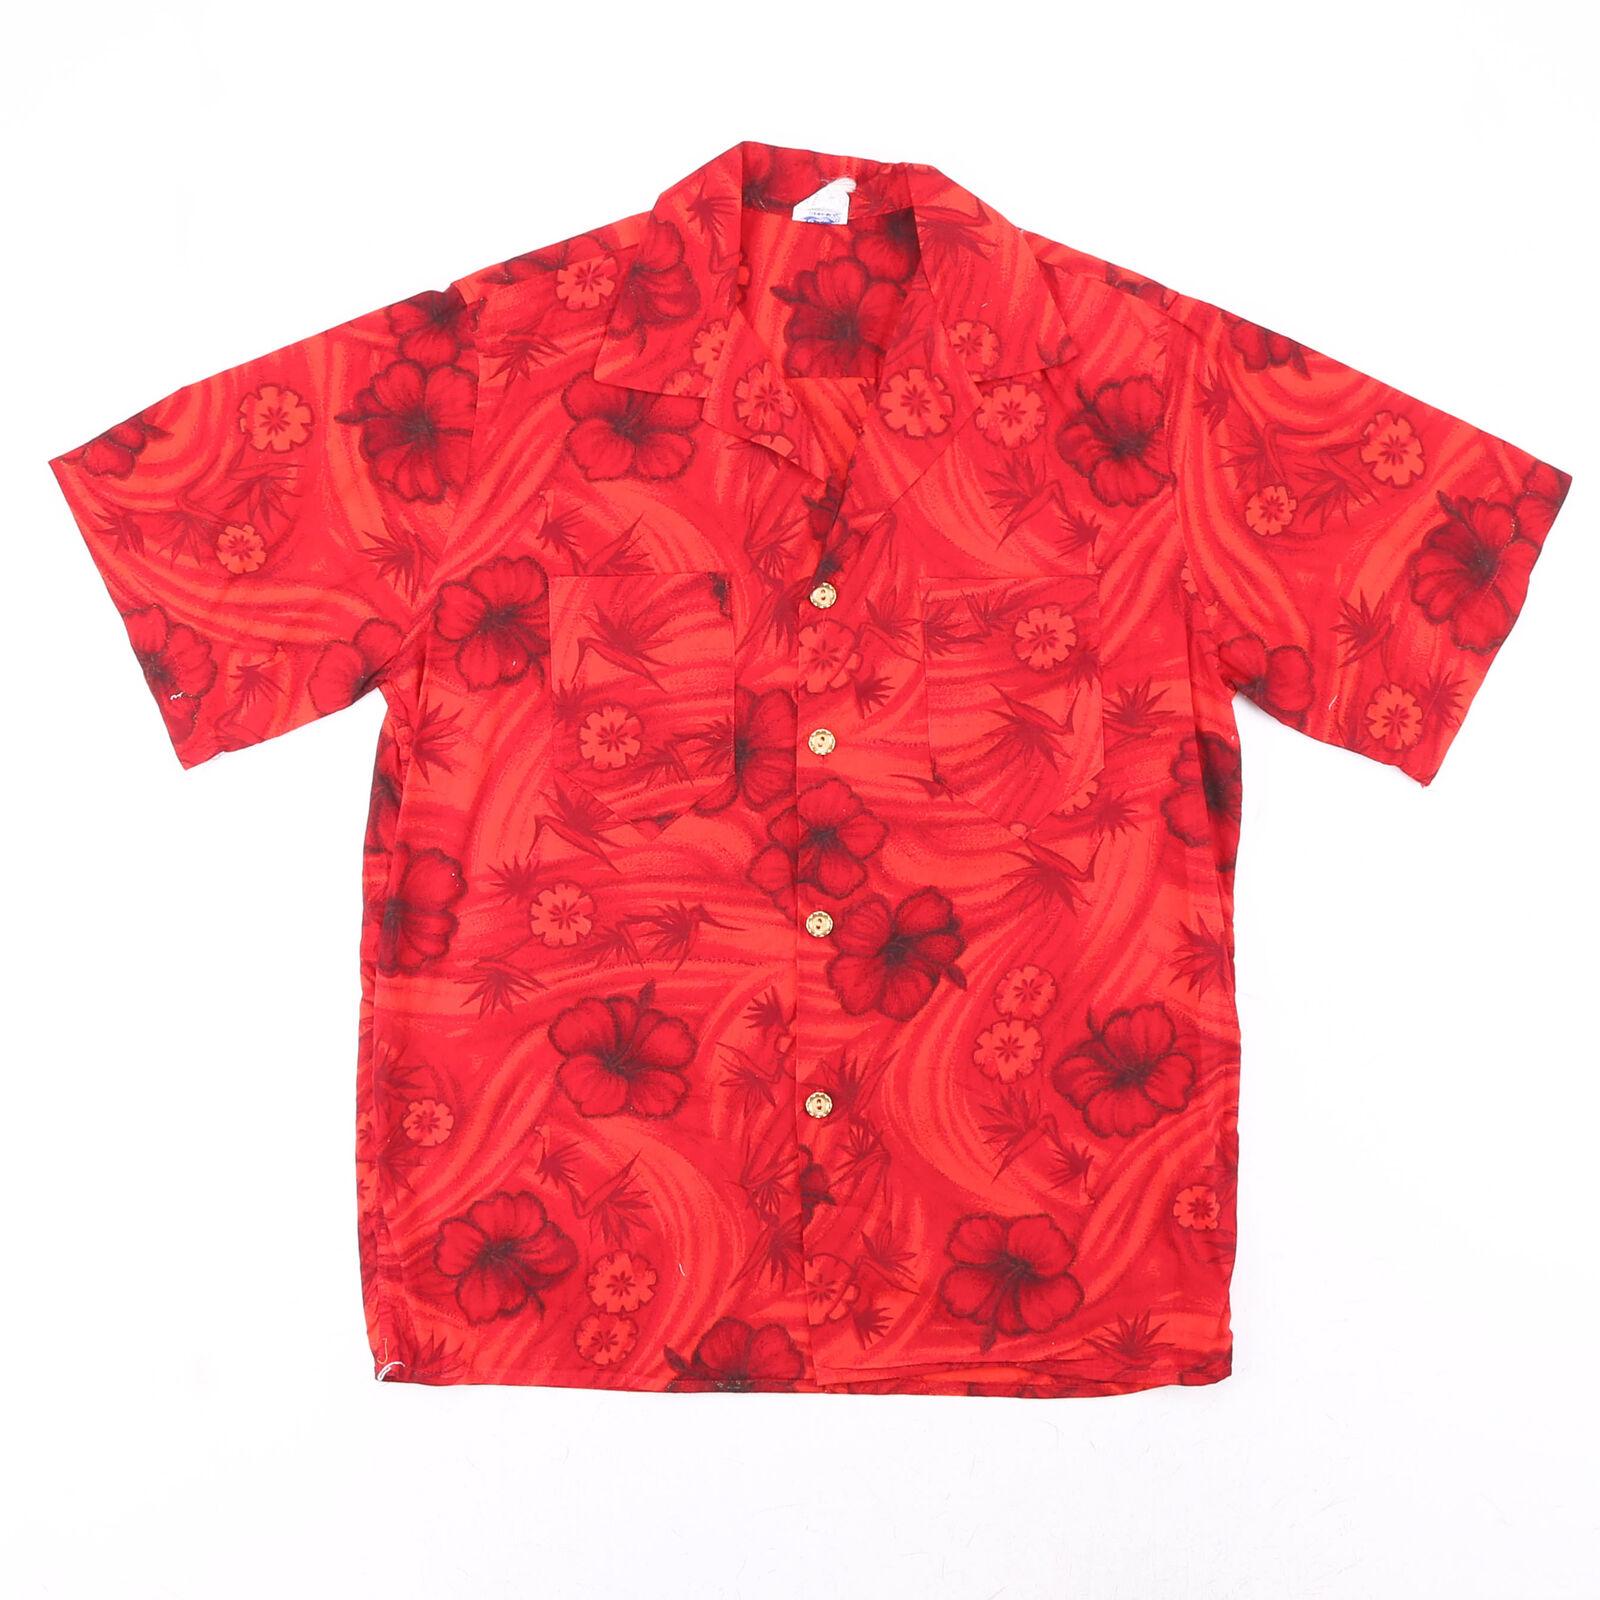 Vintage LA ROSA Red 90s Short Sleeve Crazy Print Shirt Mens M